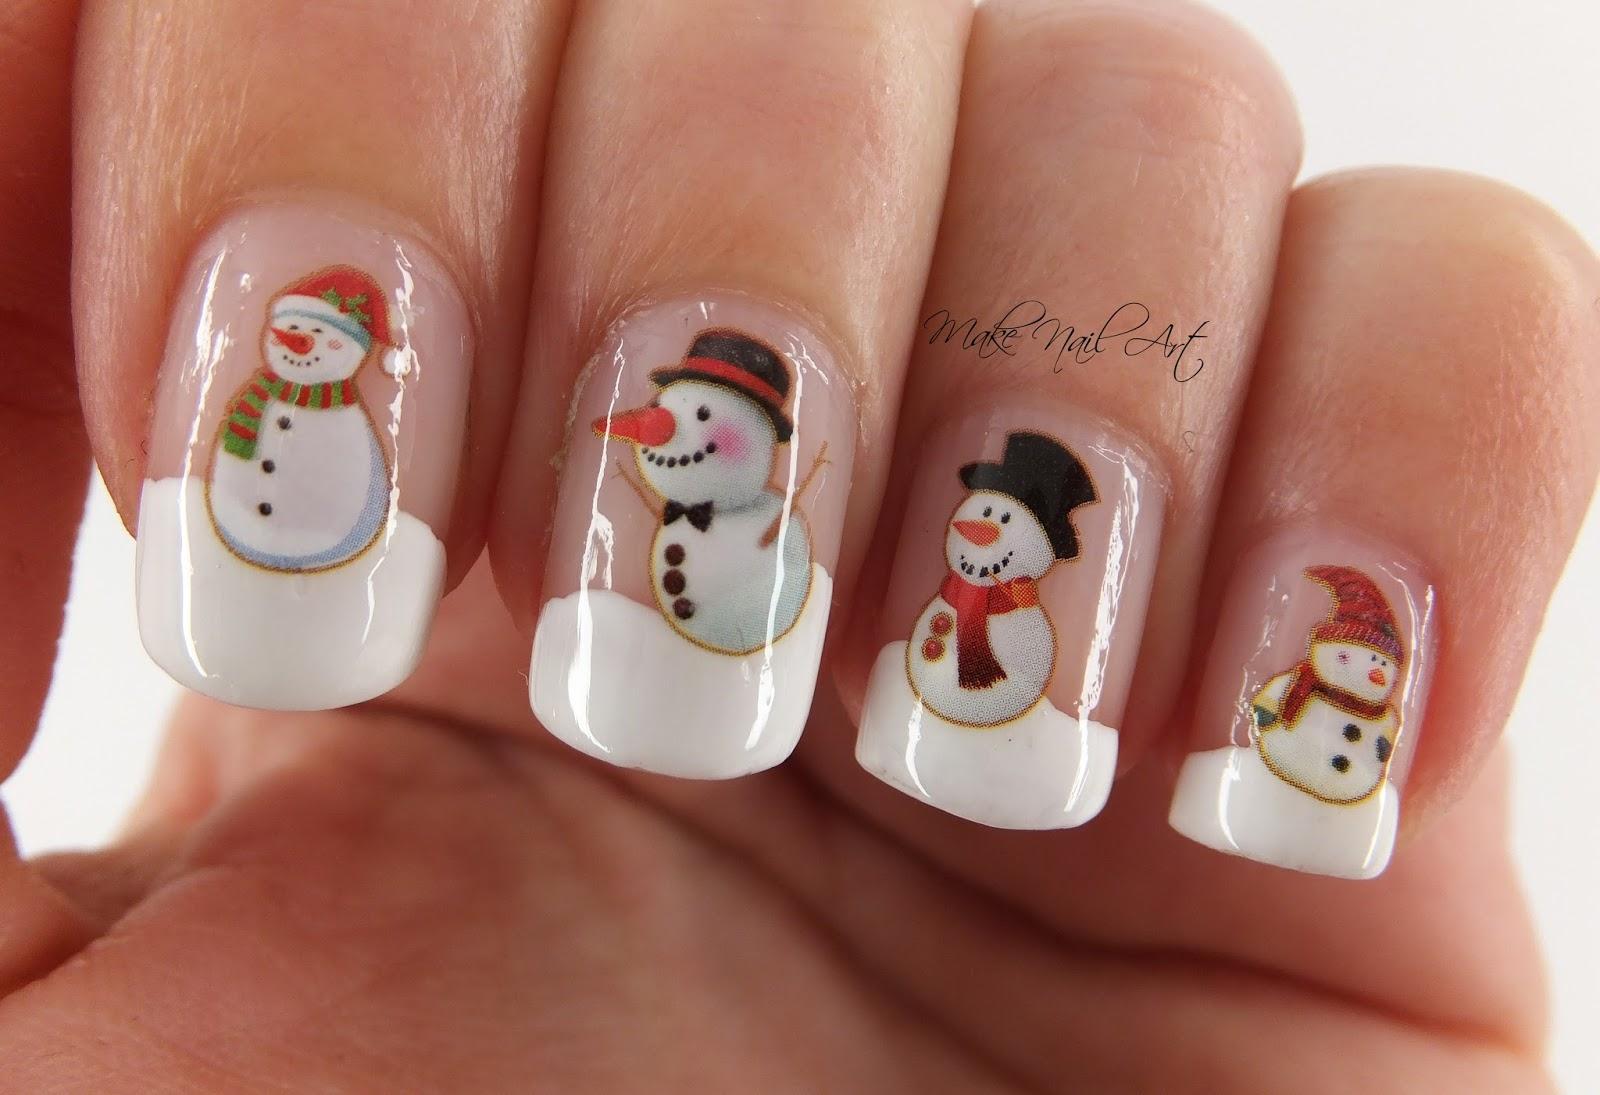 Make nail art snowmen water decals nail art design tutorial video tutorial prinsesfo Images